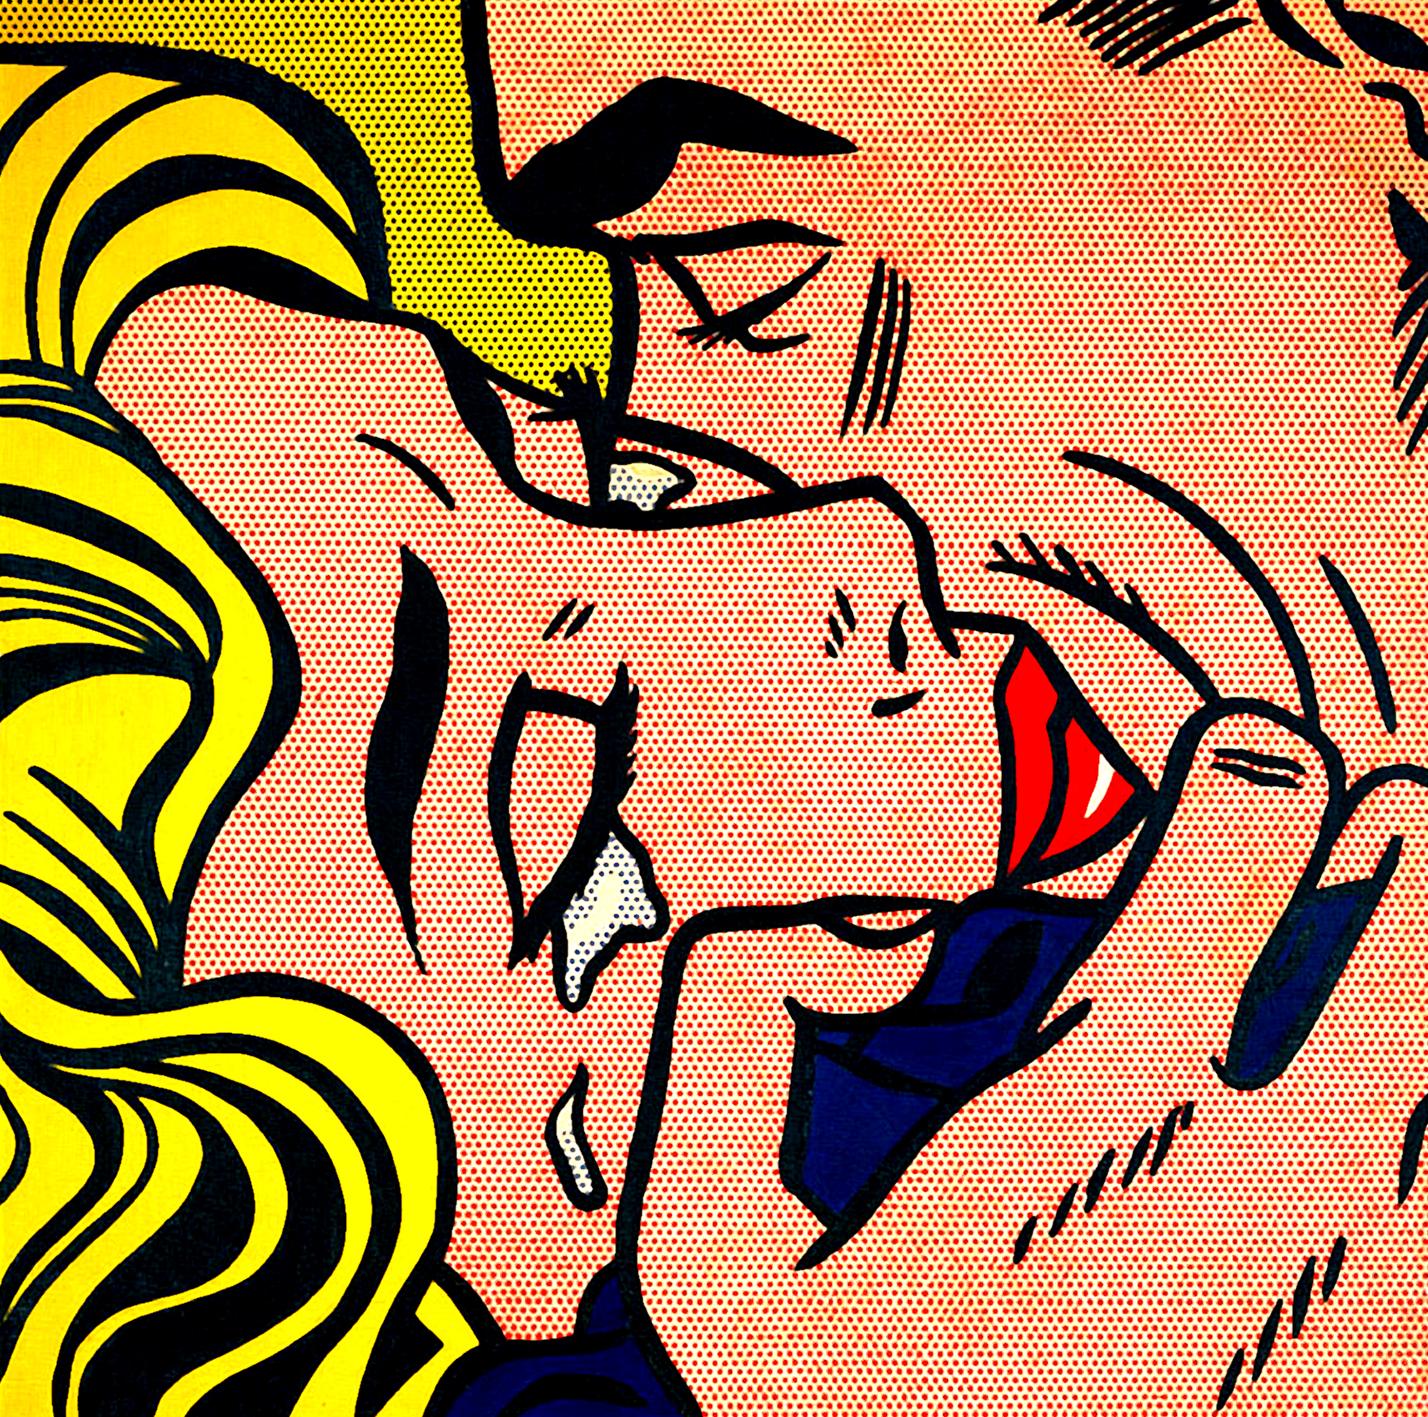 Drawn pixel art kiss #14